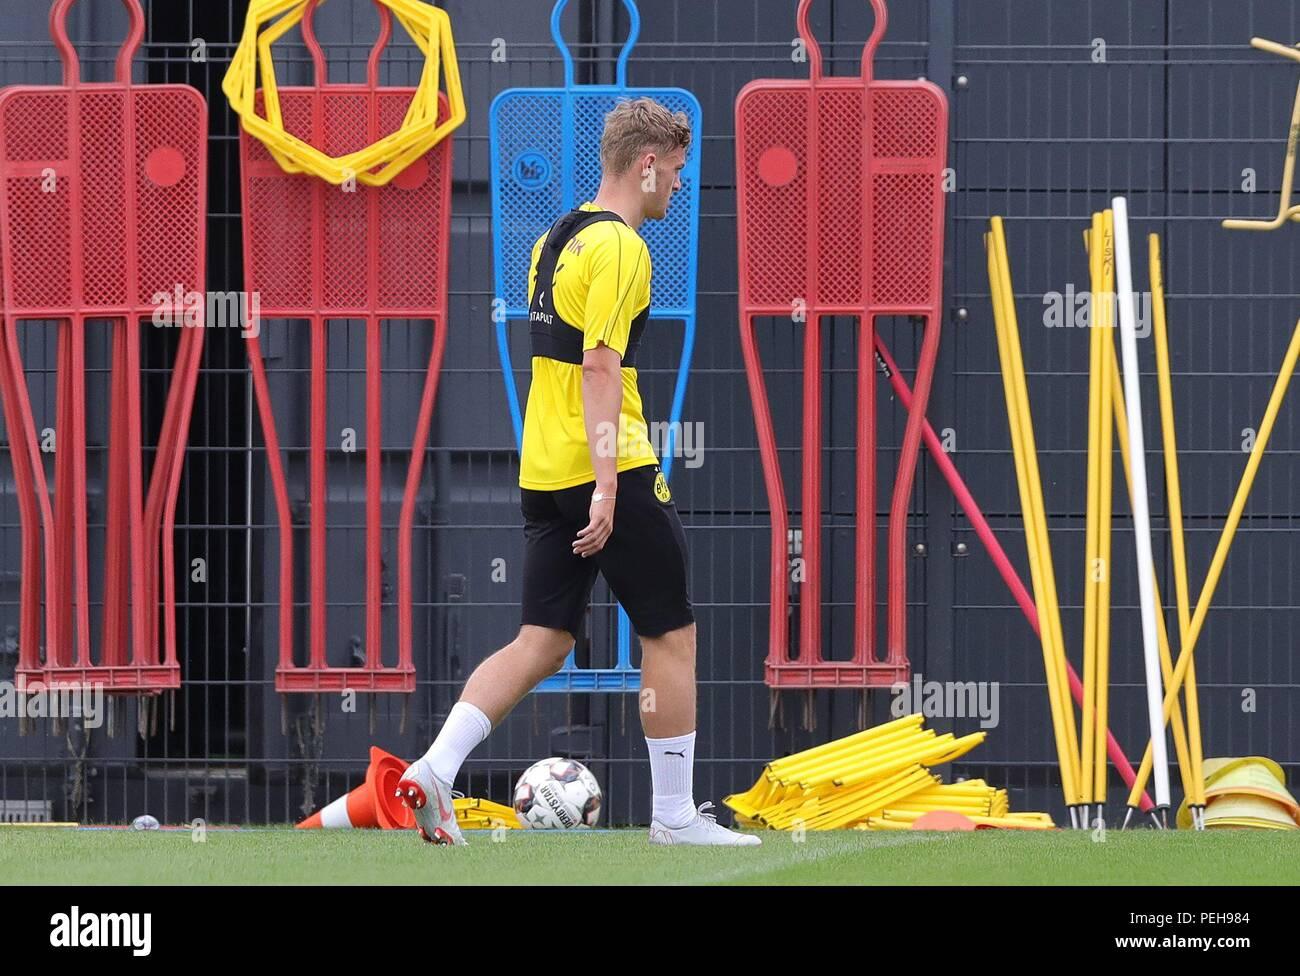 firo: 15.08.2018, football, 1.Bundesliga, season 2018/2019, BVB, Borussia Dortmund, training, Bruun LARSEN gives sprintubung   usage worldwide - Stock Image